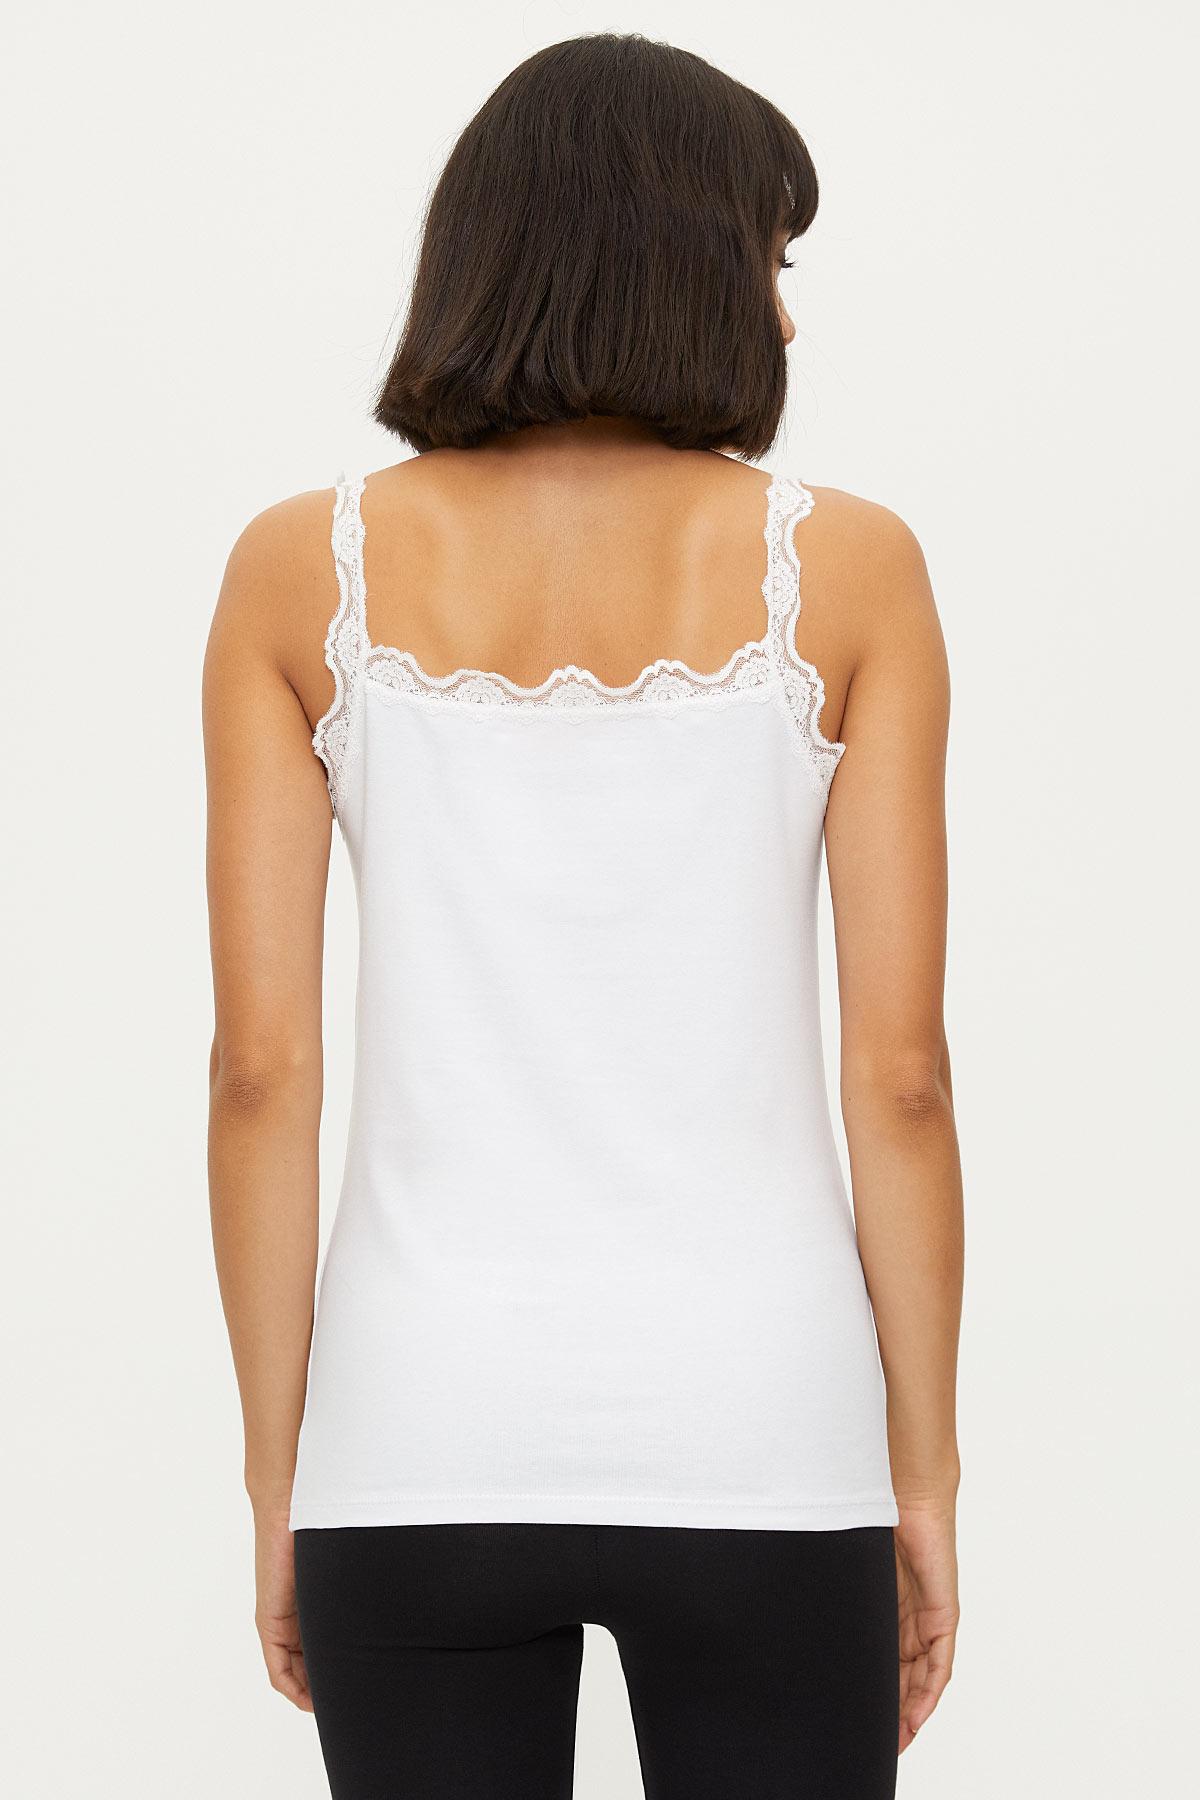 Lycra Strappy Ladies Lacy Undershirt